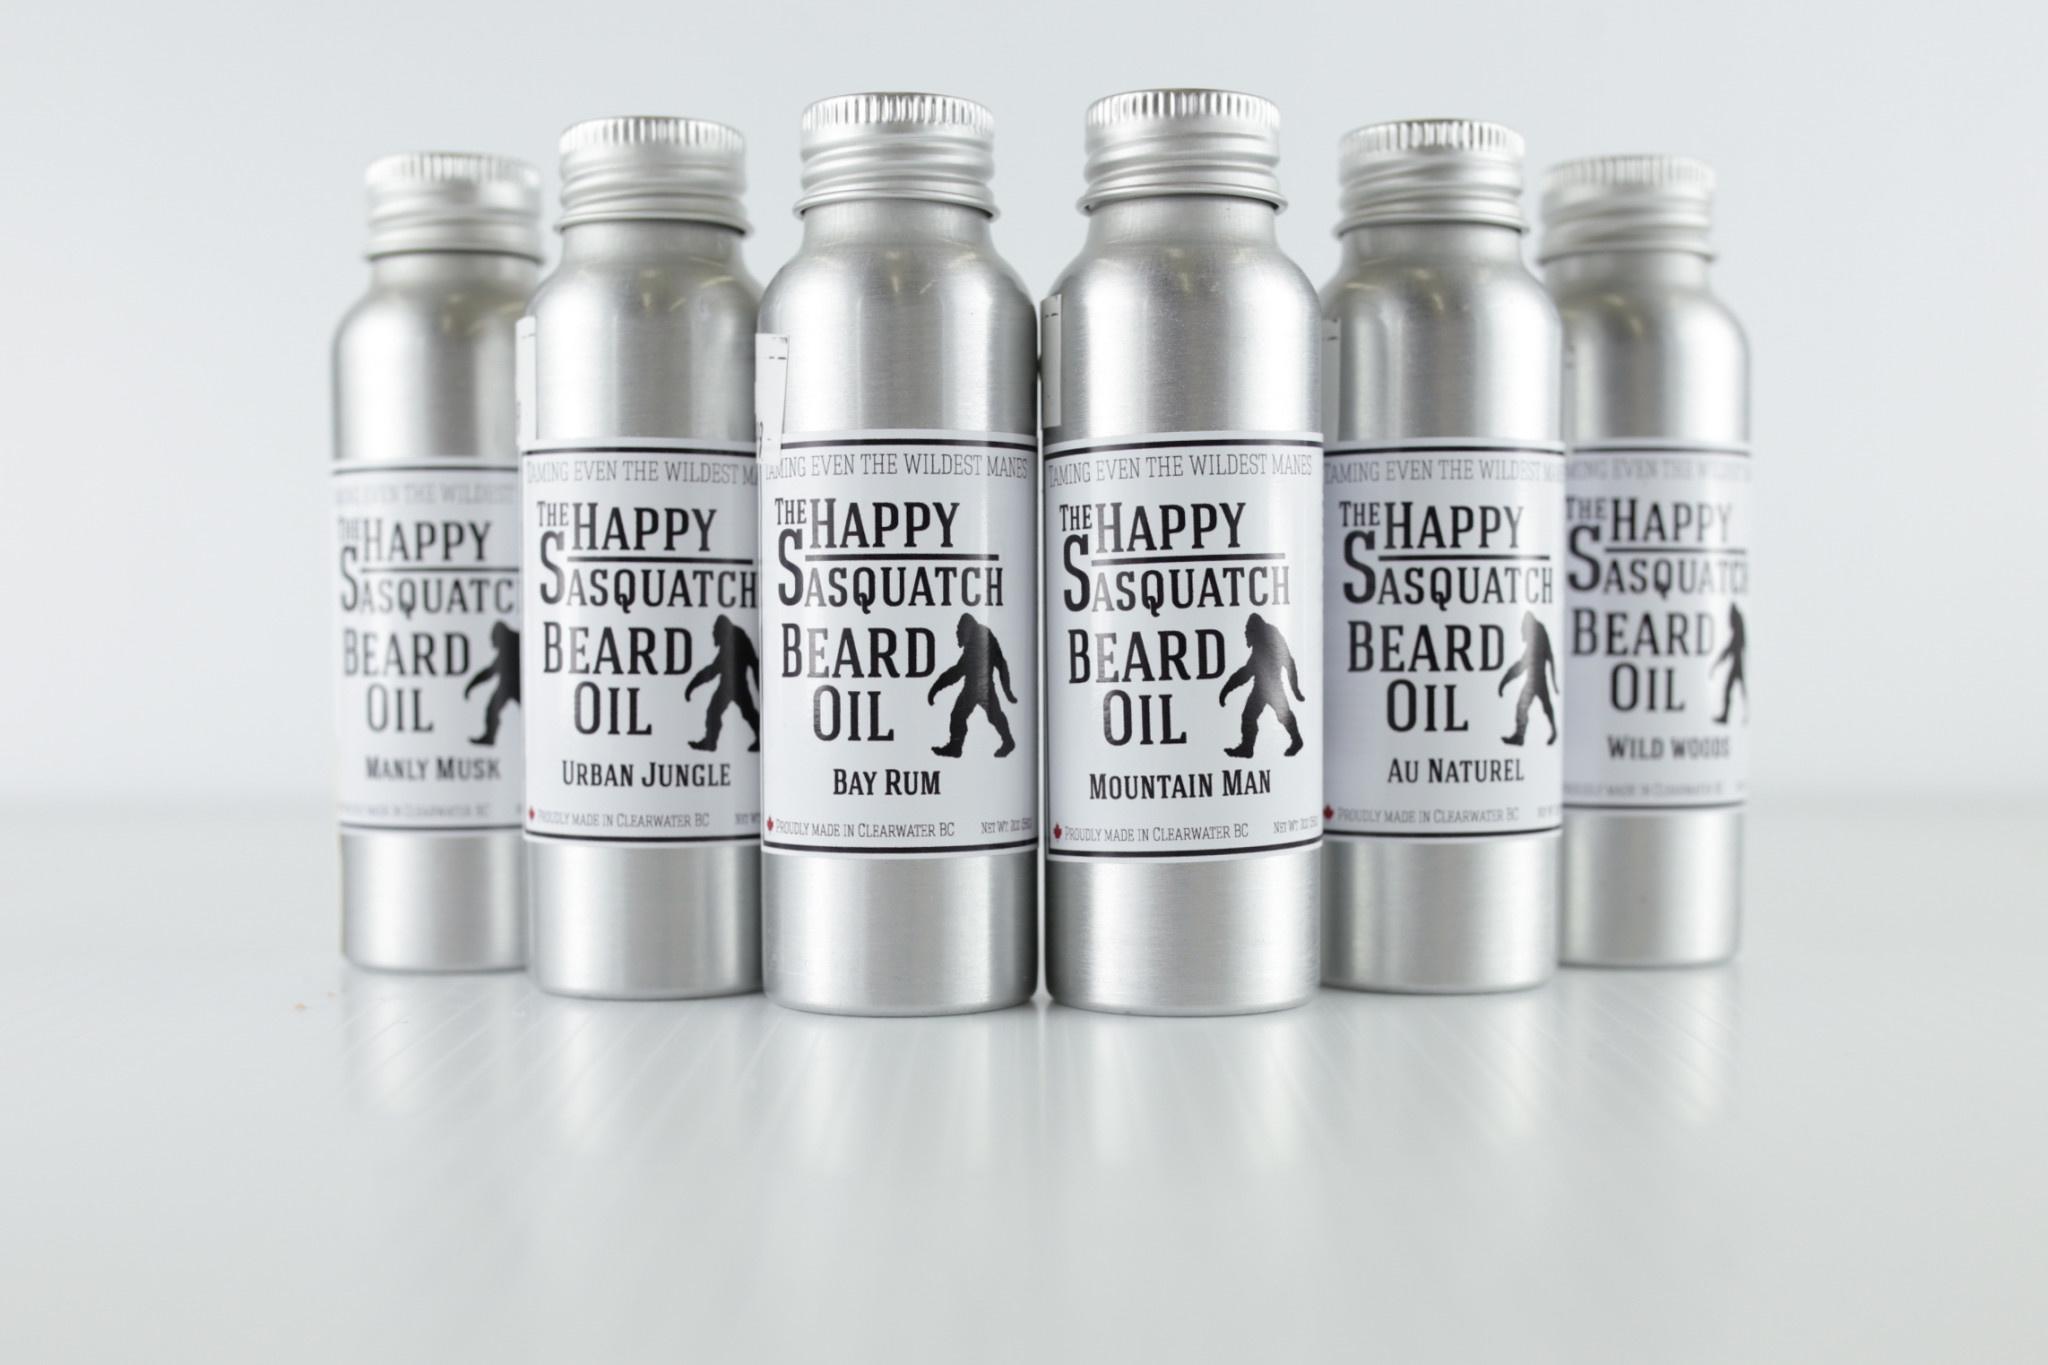 Happy Sasquatch Beard Oil Bay Rum